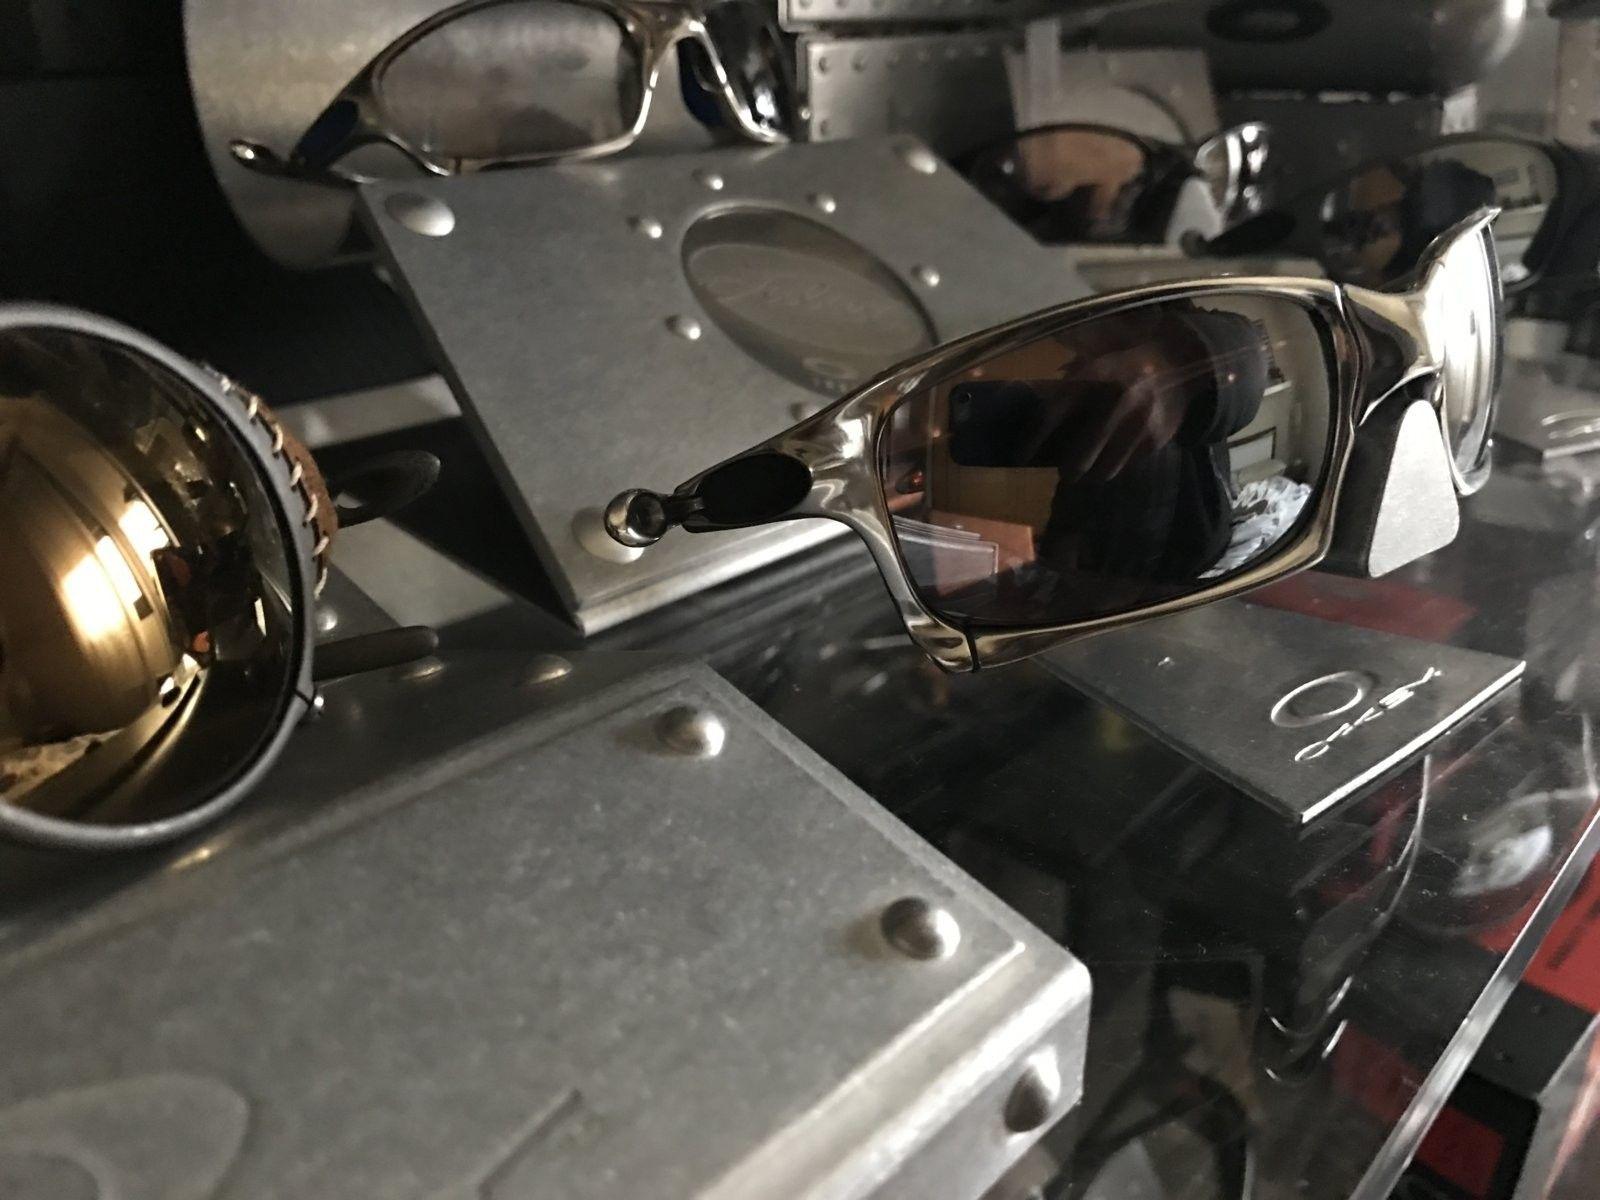 More metals: HalX, juliet Ducati, Xsquared polished - IMG_5108.JPG